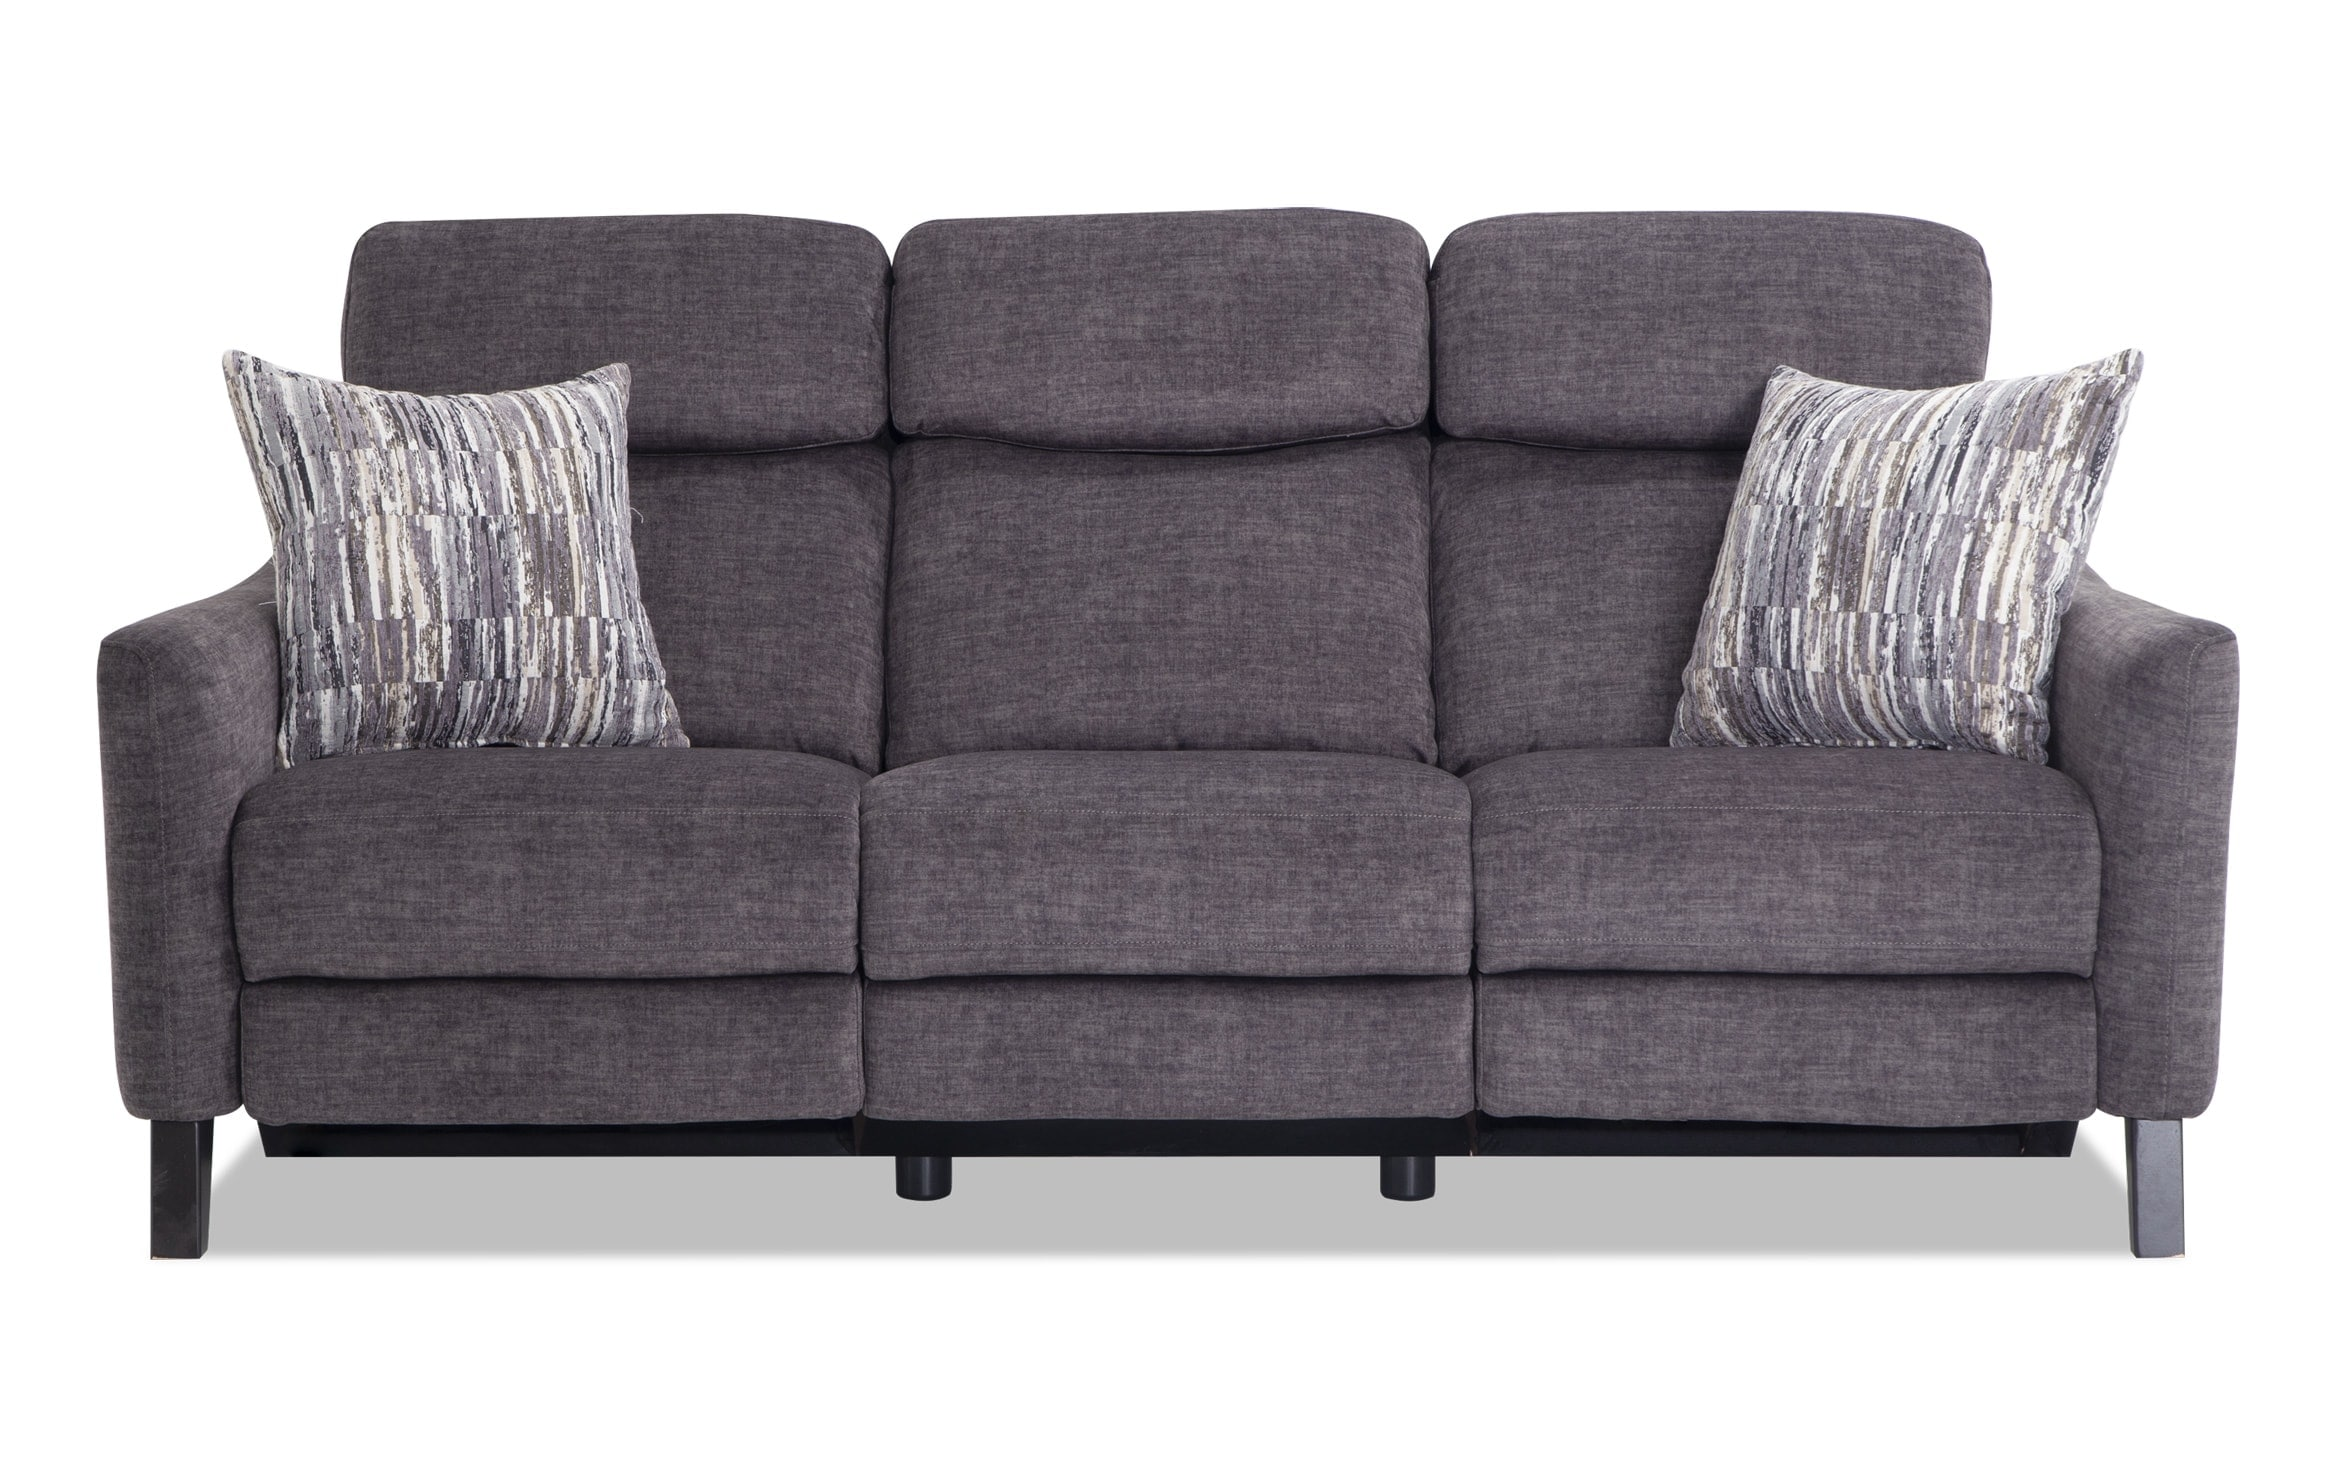 Symmetry Fabric Reclining Sofa